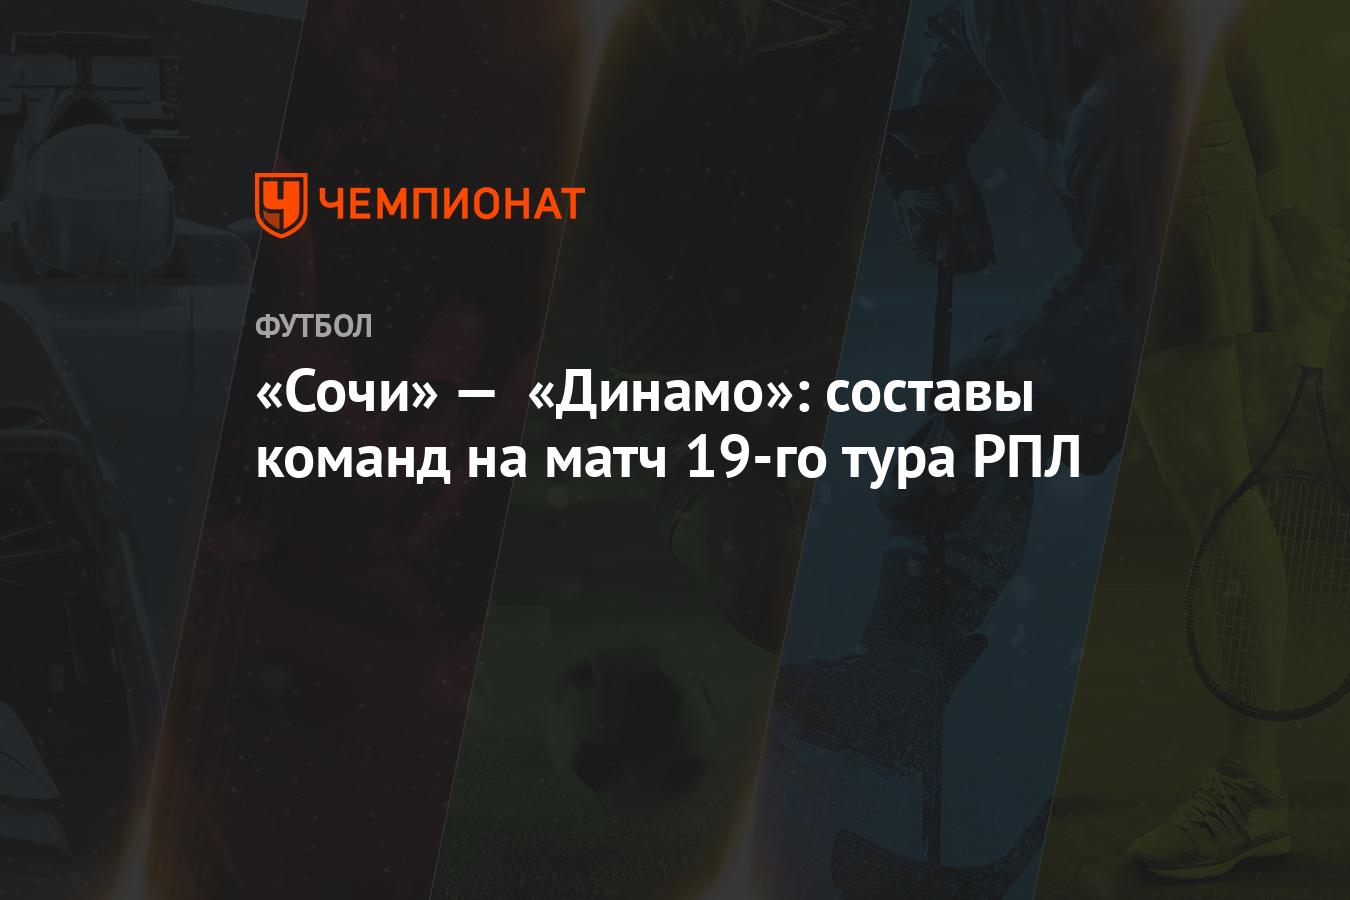 «Сочи» — «Динамо»: составы команд на матч 19-го тура РПЛ - Чемпионат